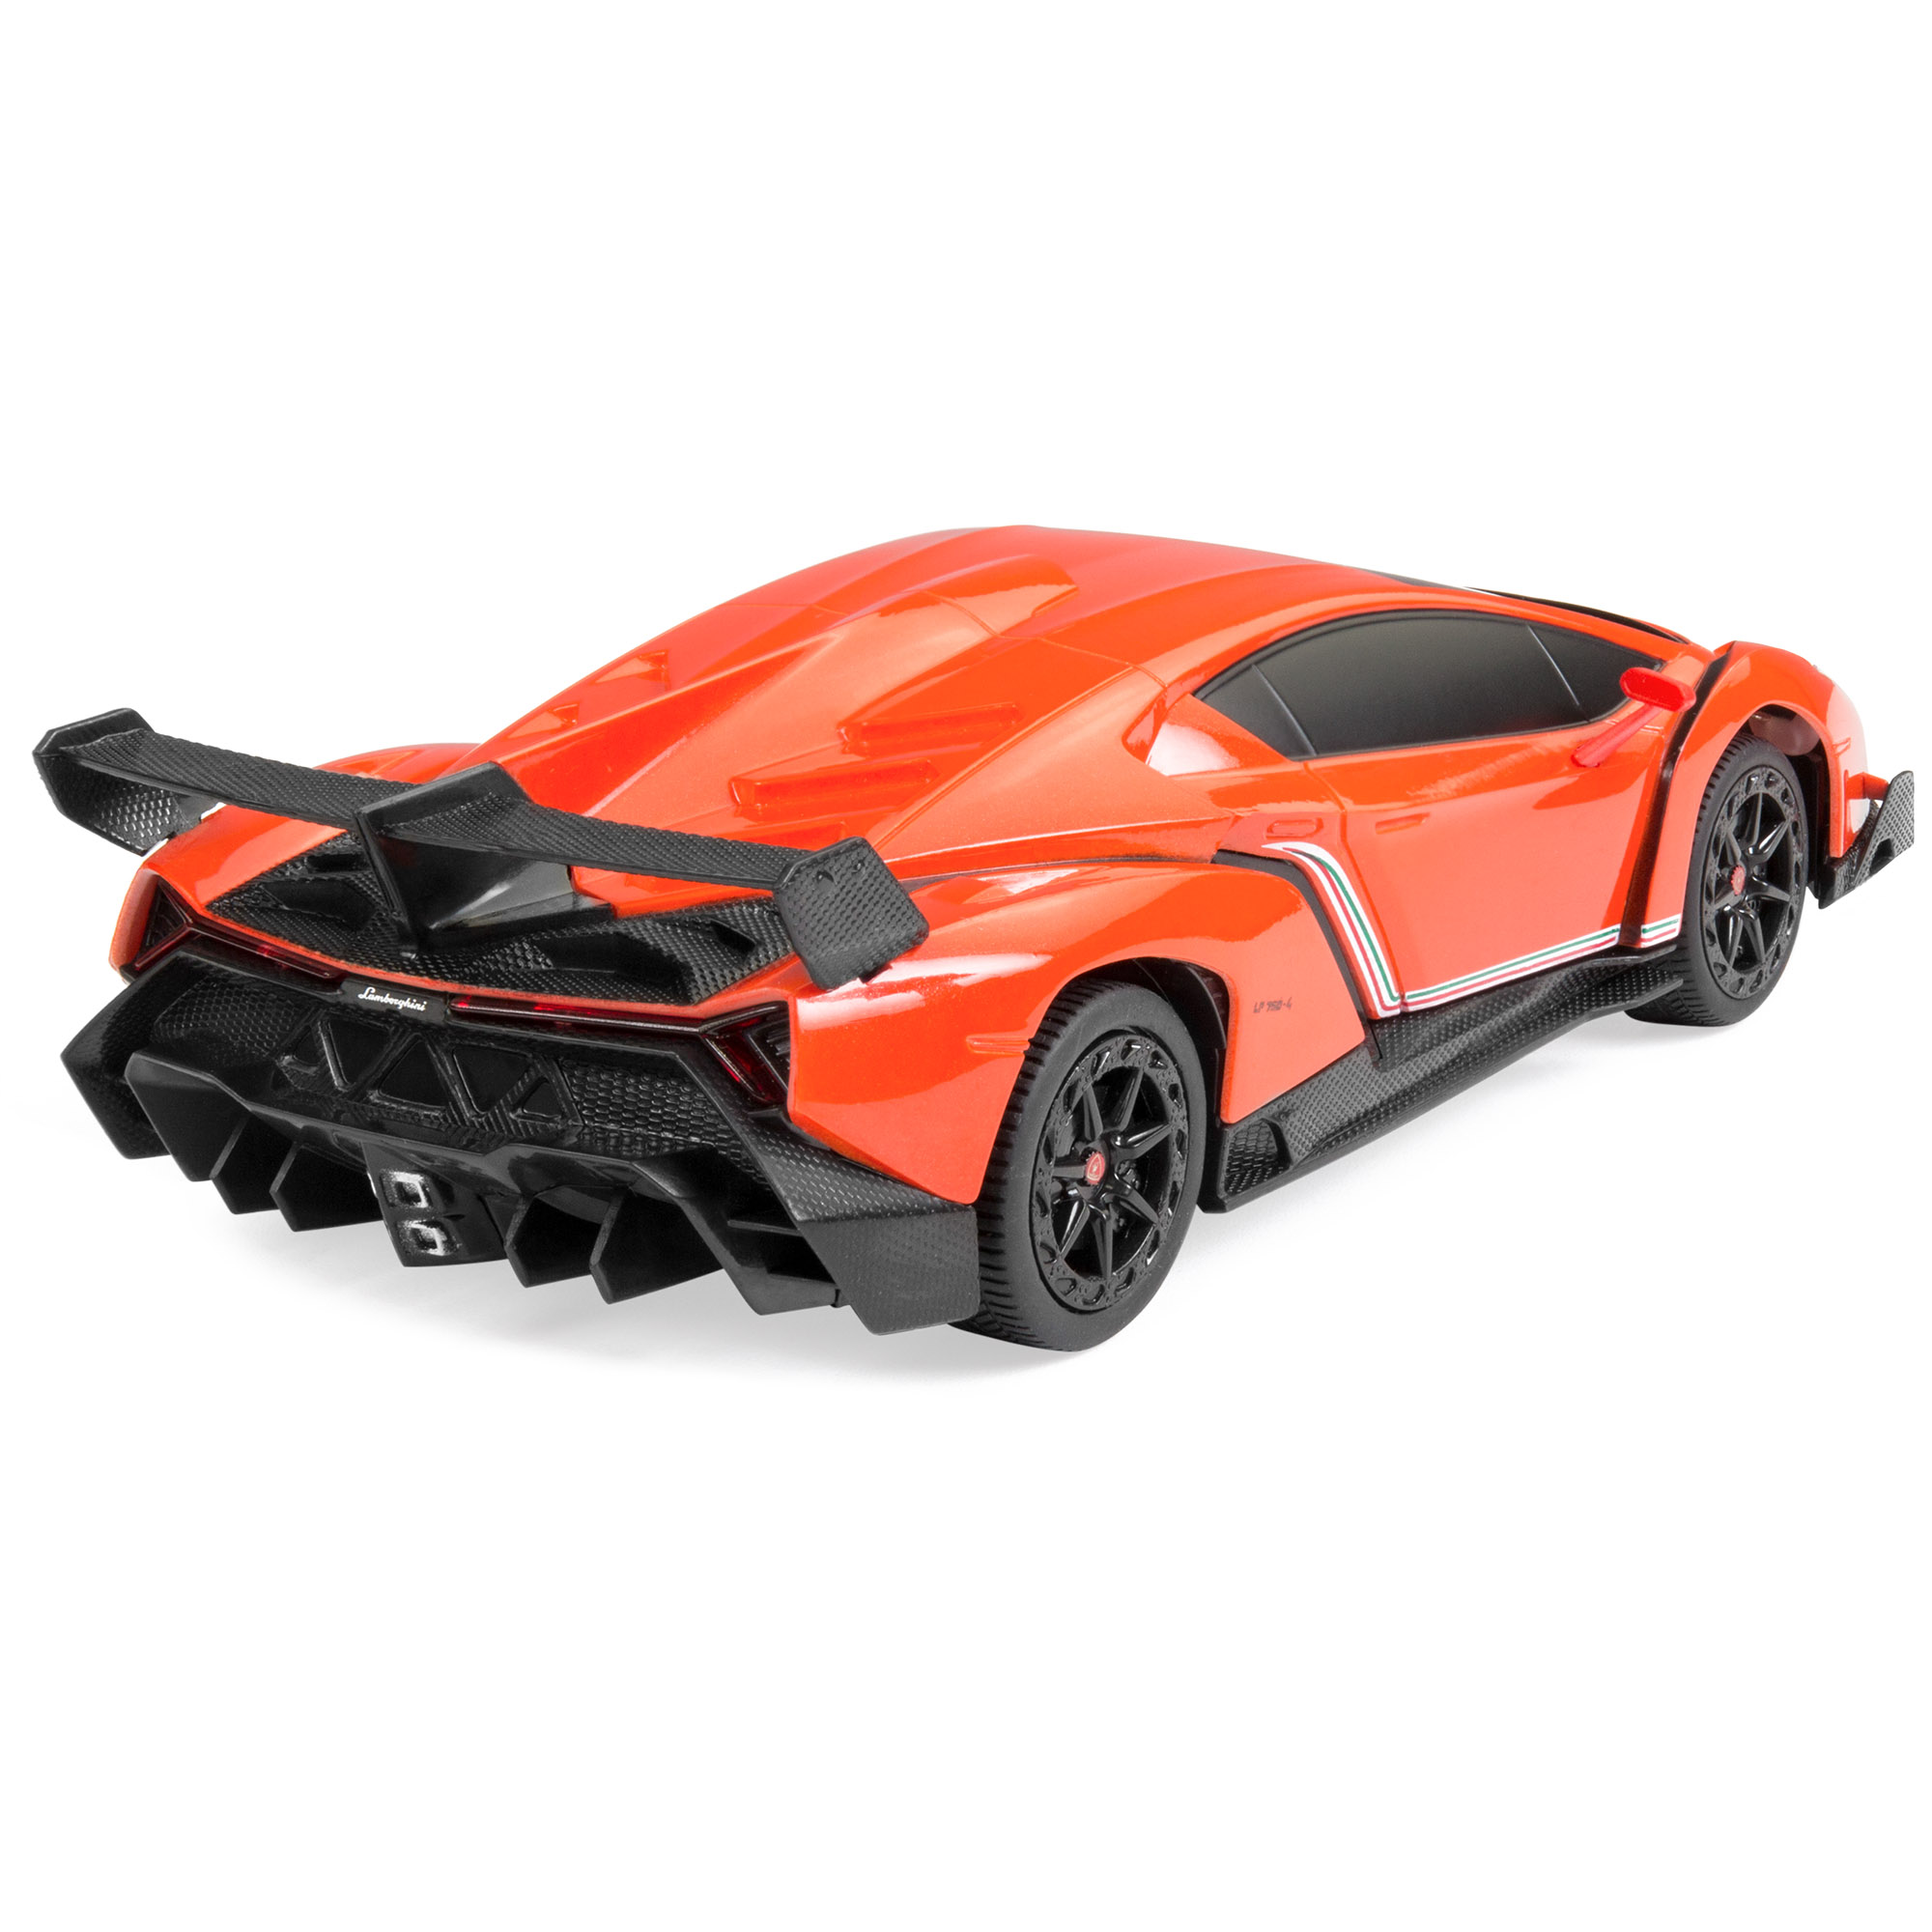 BCP-1-24-Kids-RC-Lamborghini-Veneno-Racing-Car-Toy-w-Lights-Shock-Suspension thumbnail 11